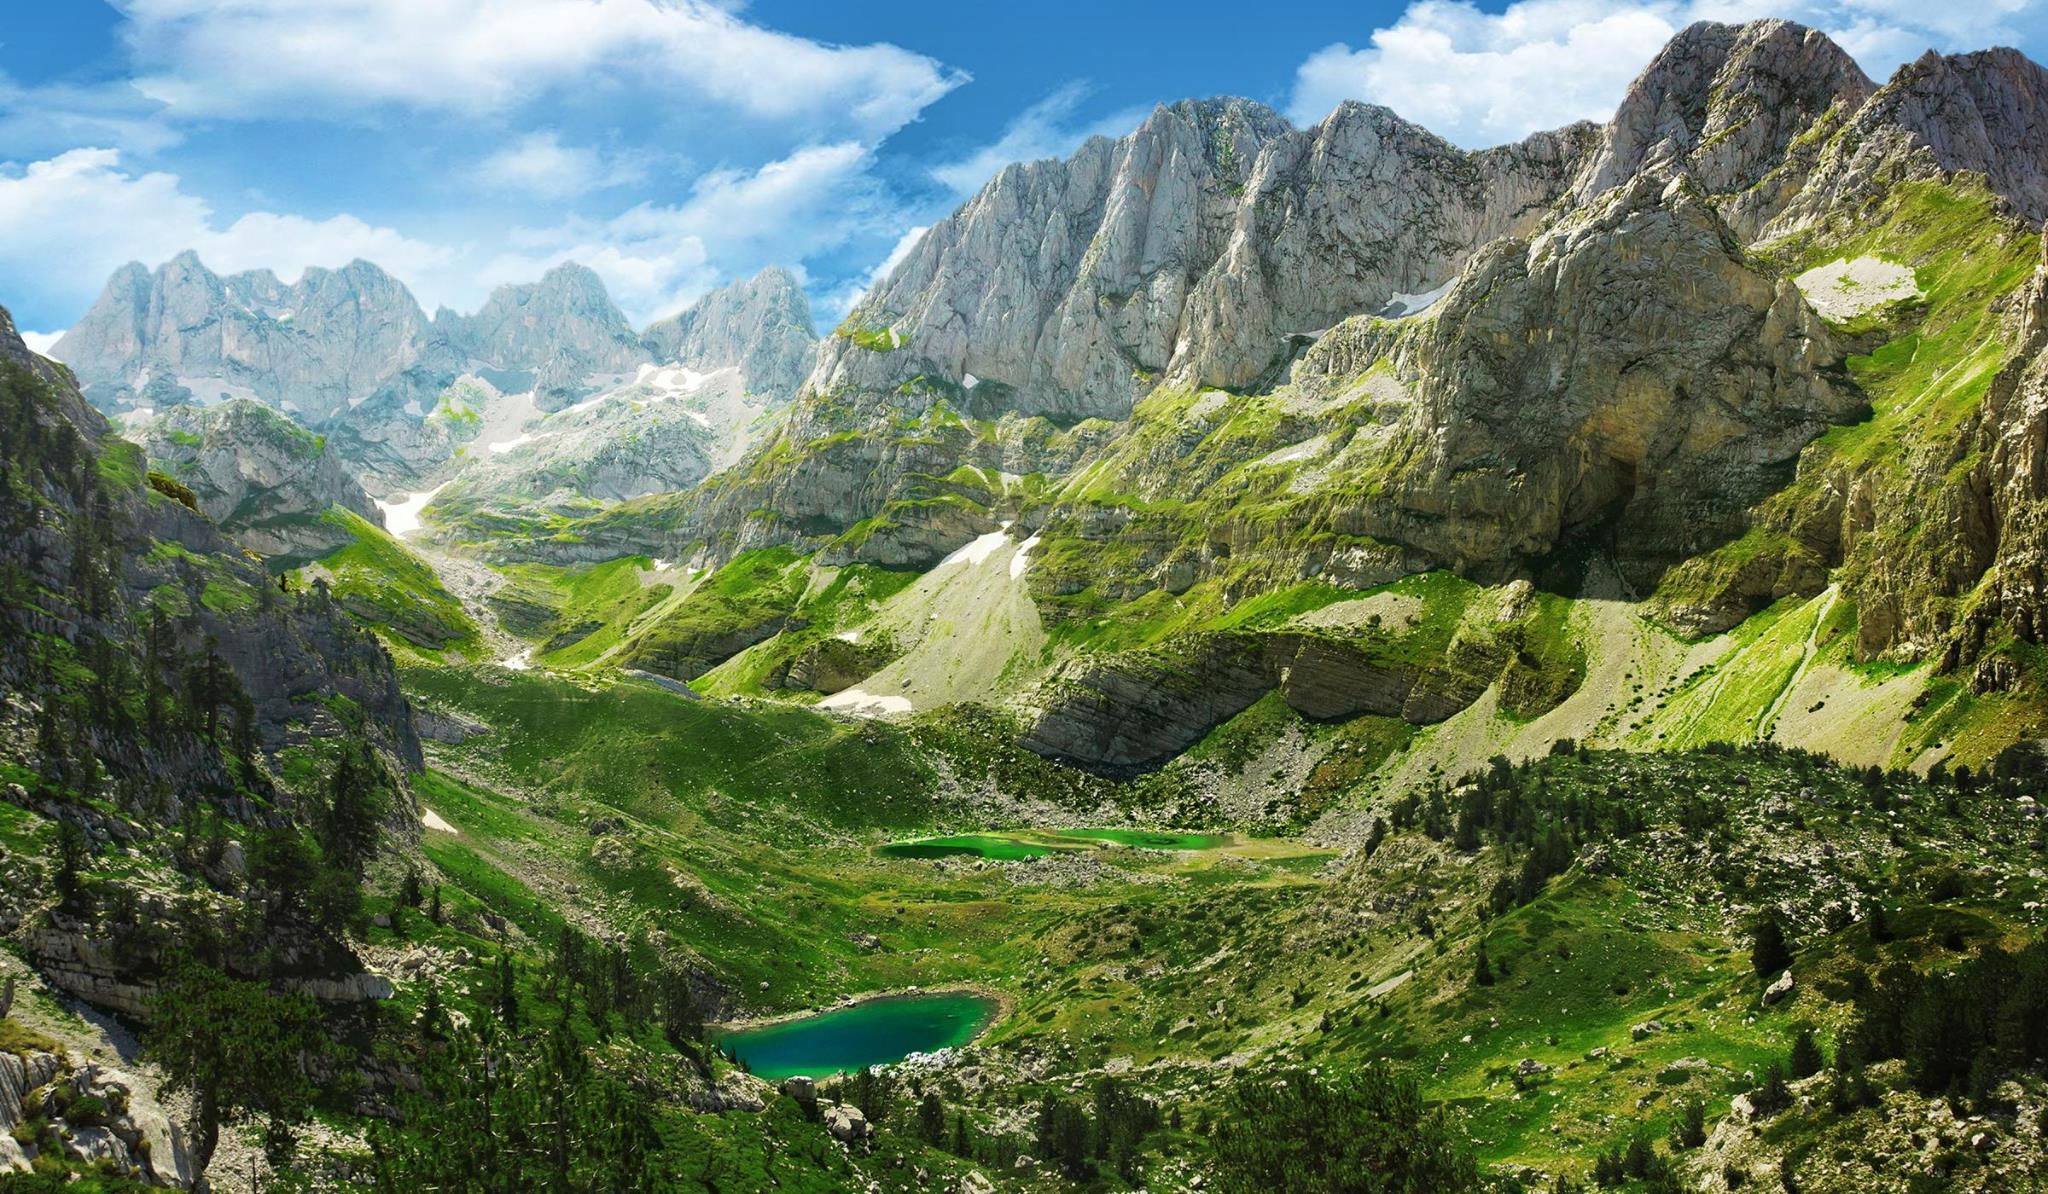 Magjia e Alpeve Shqiptare